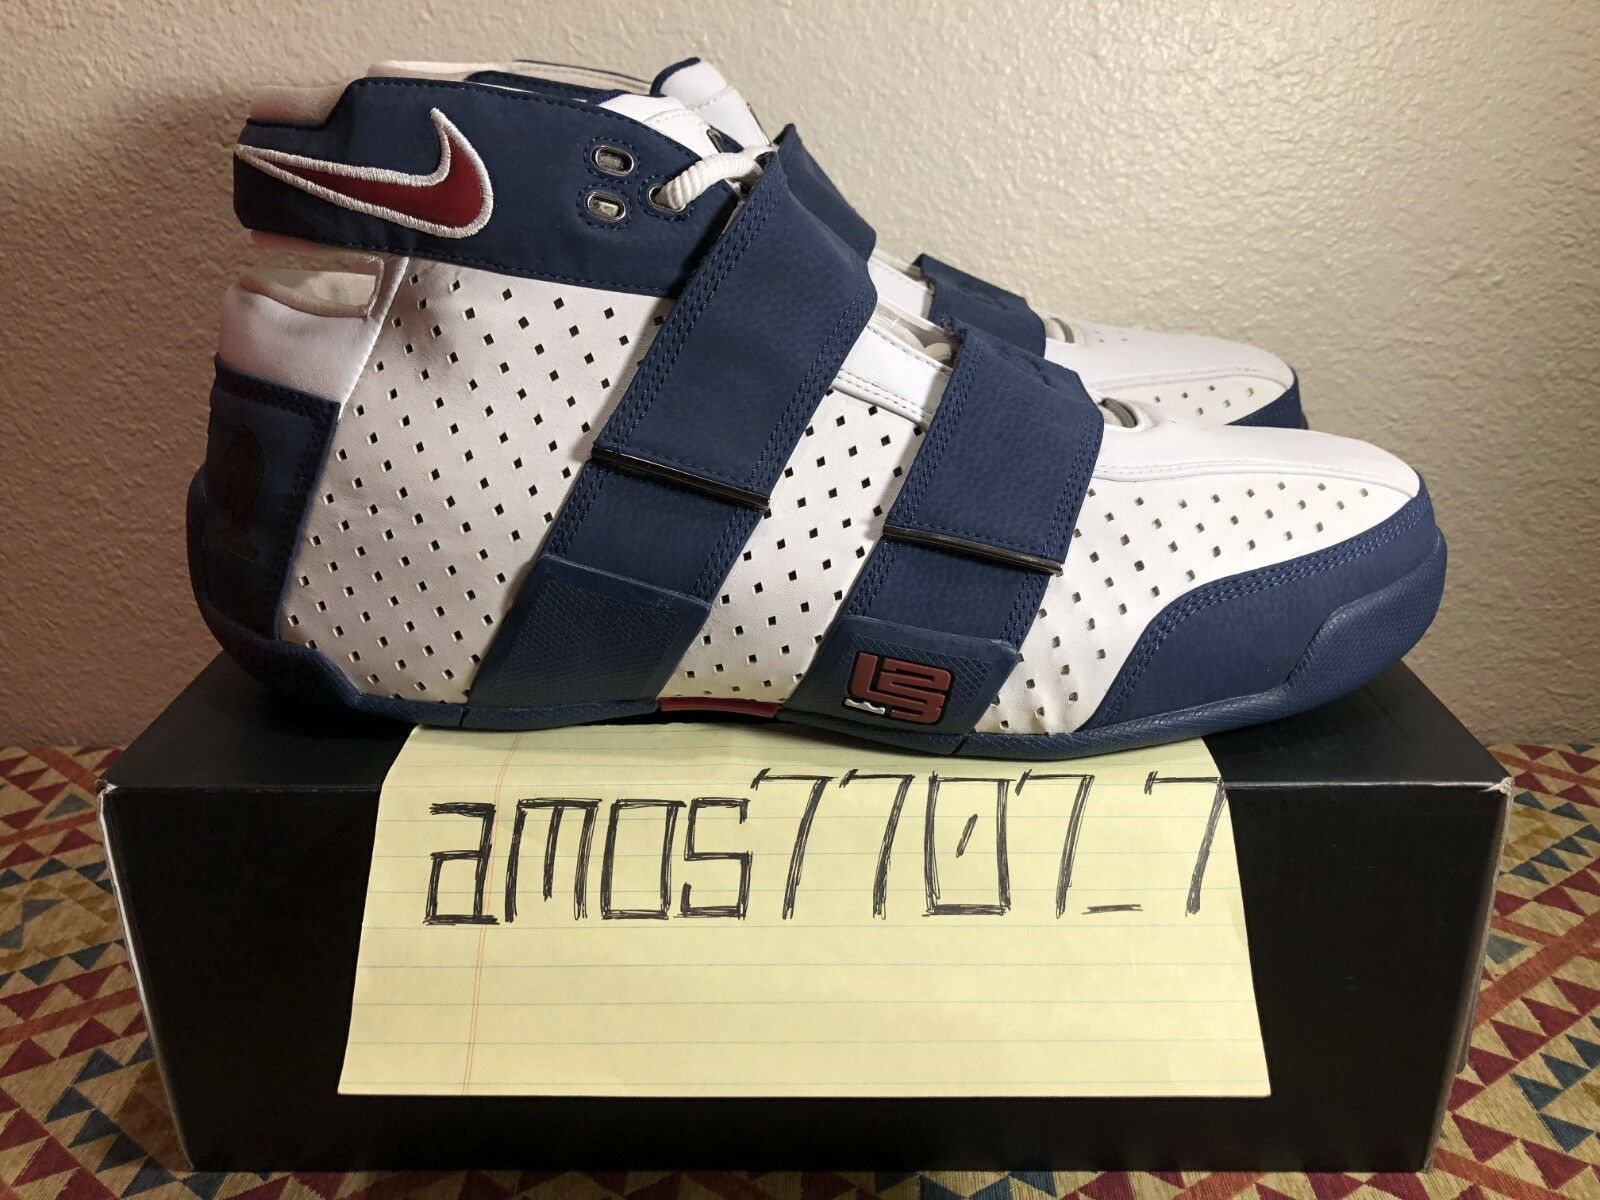 Nike Zoom 20-5-5 LeBron PE Four Horsemen White Navy bluee RARE Size SZ 16